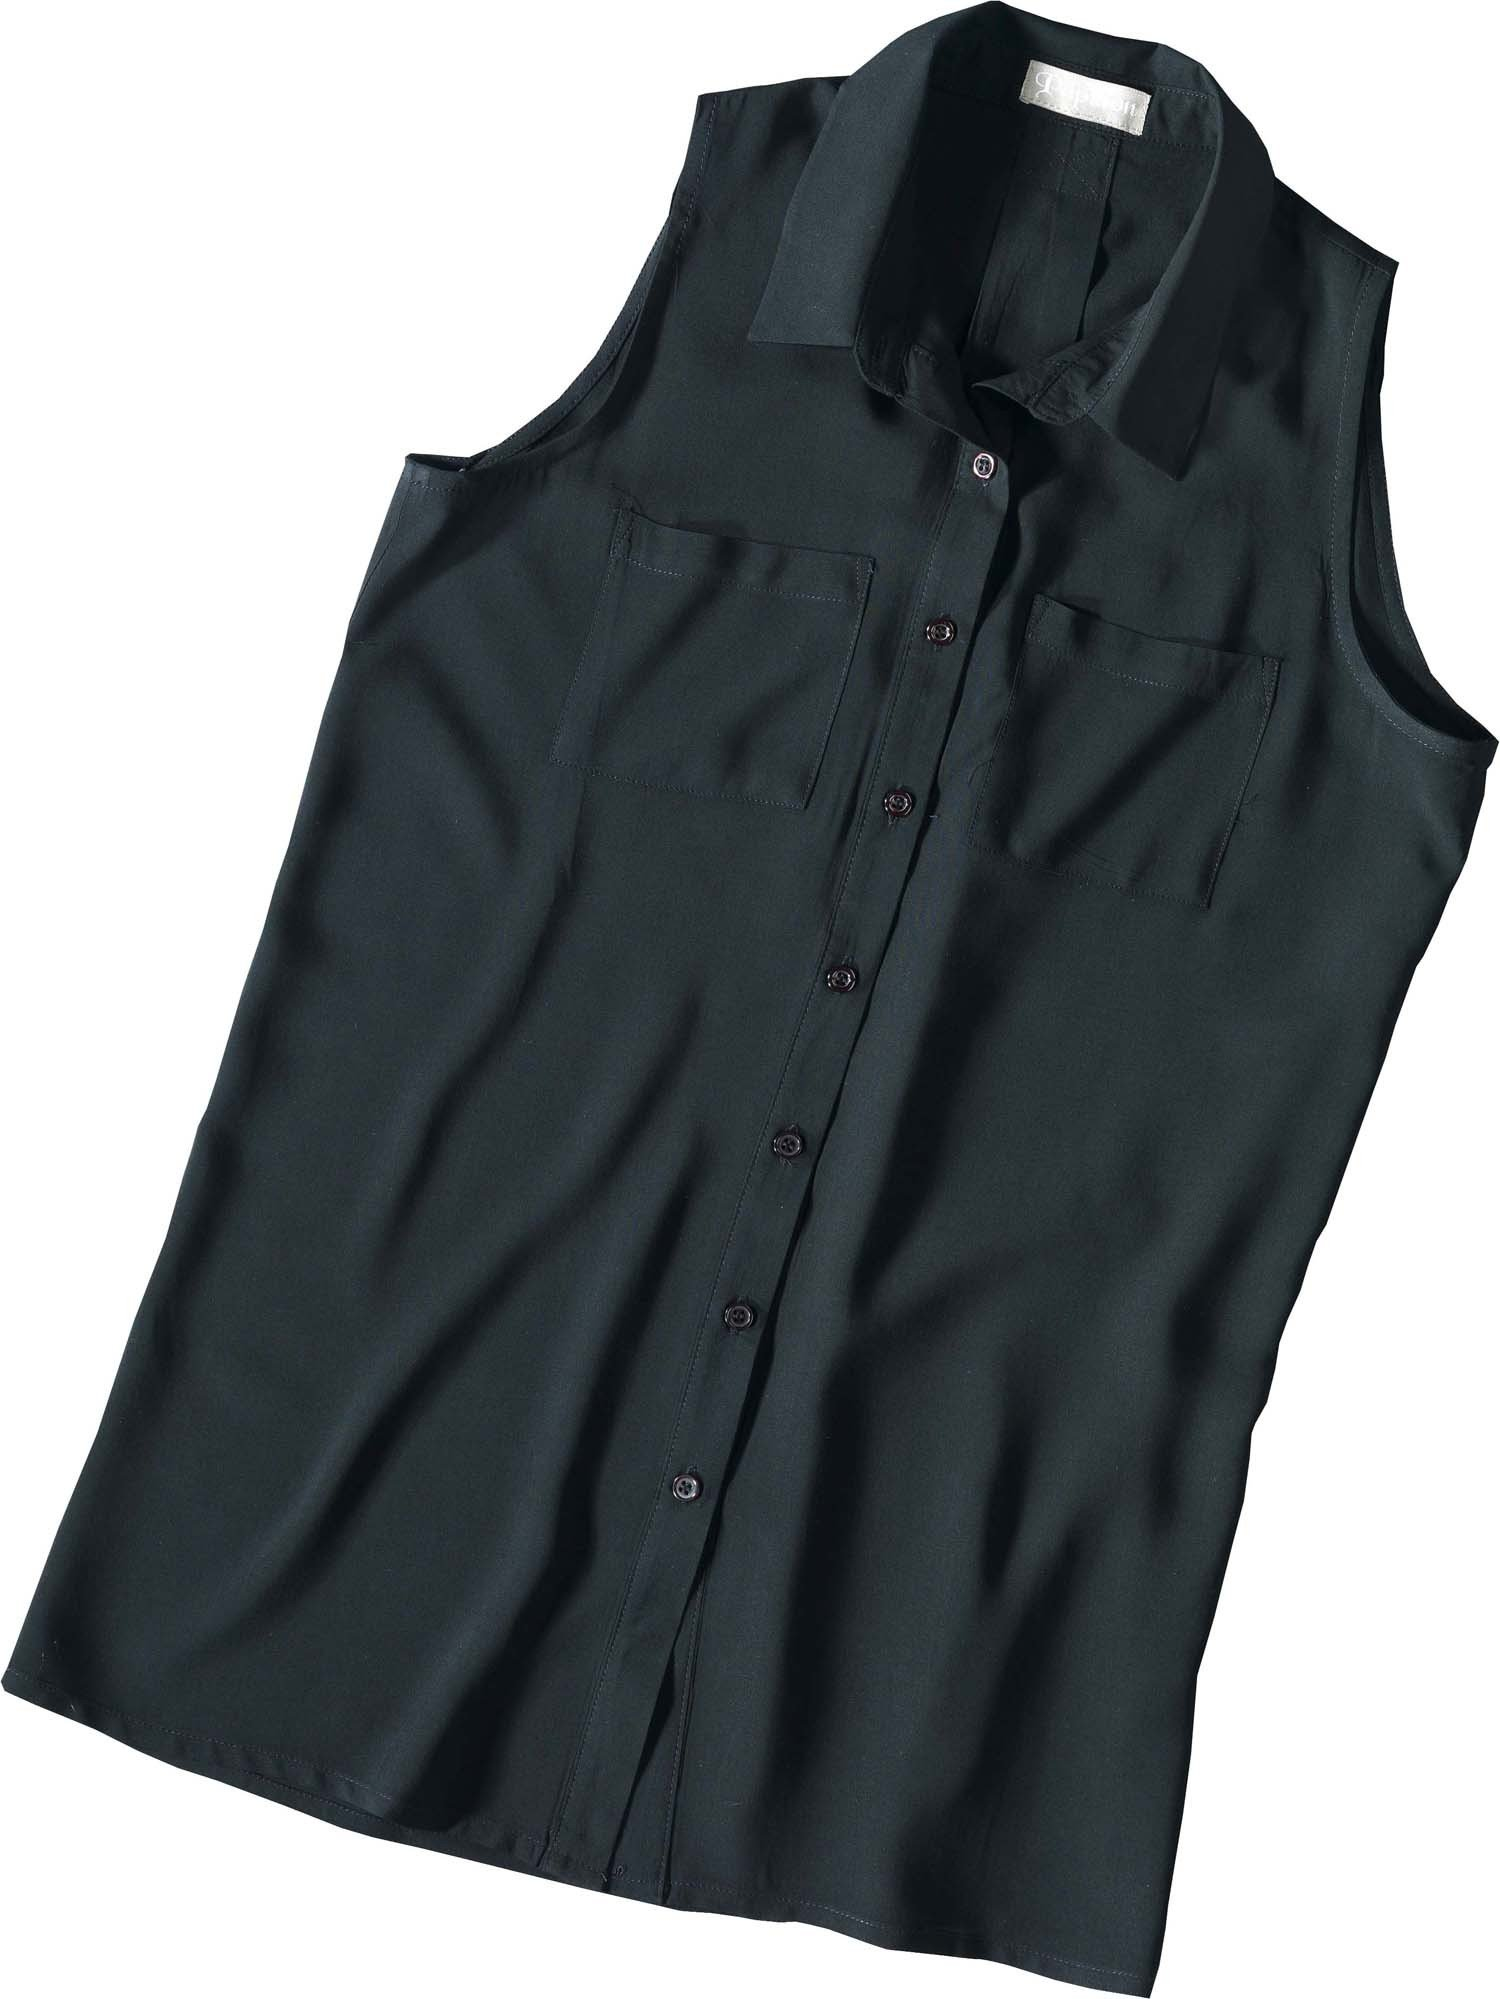 D-Gilet-Bluse, schwarz M 010 - 2 - Ronja.ch